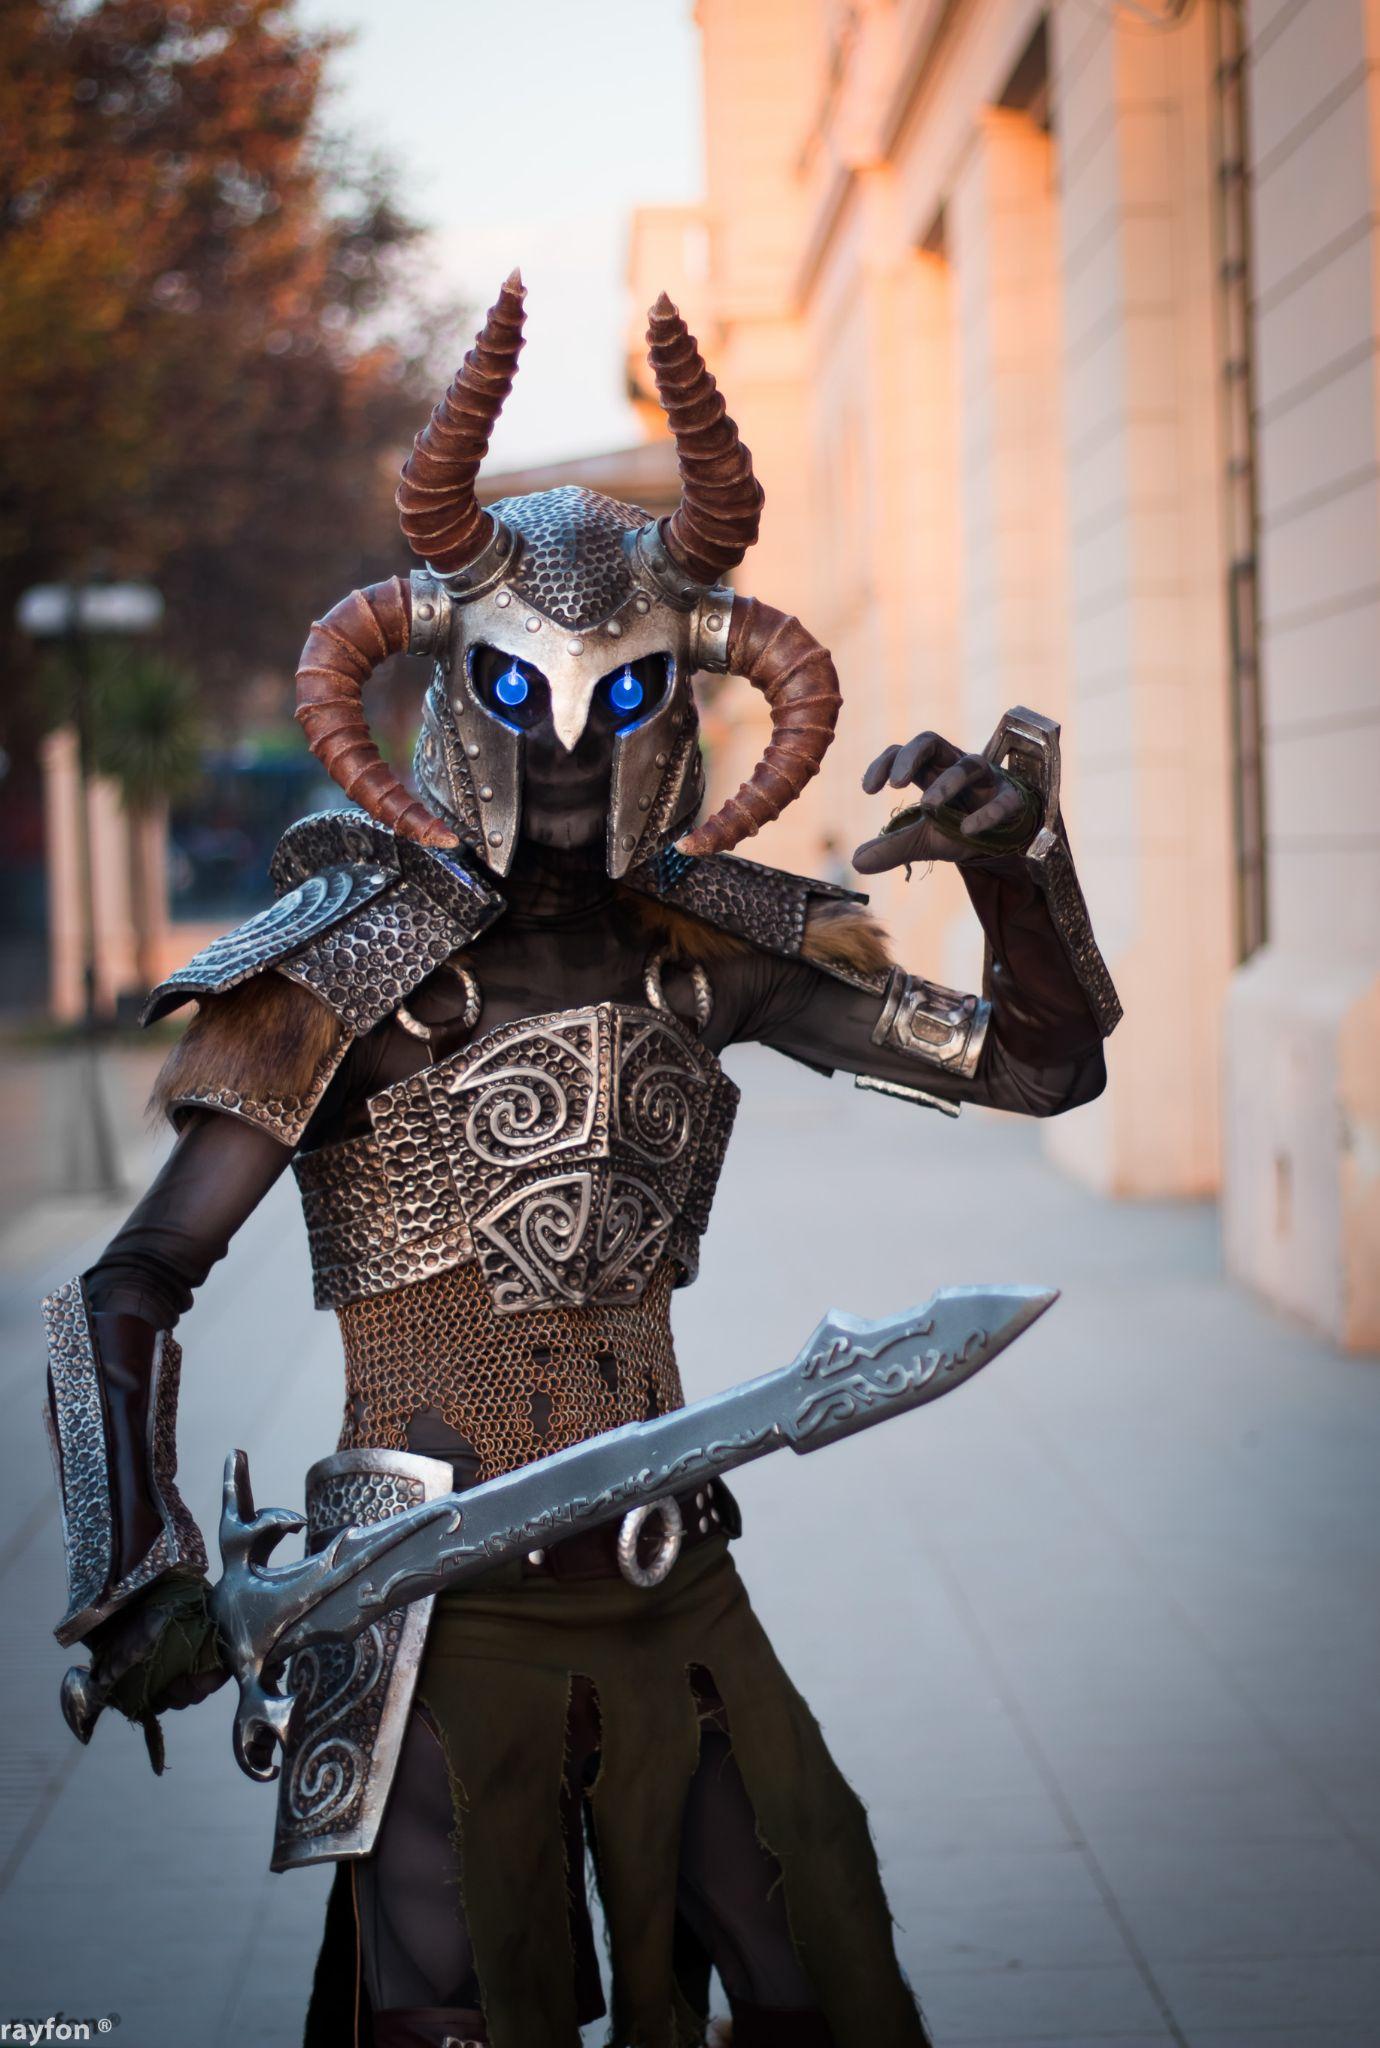 Skyrim Armor by Rainiero Barra